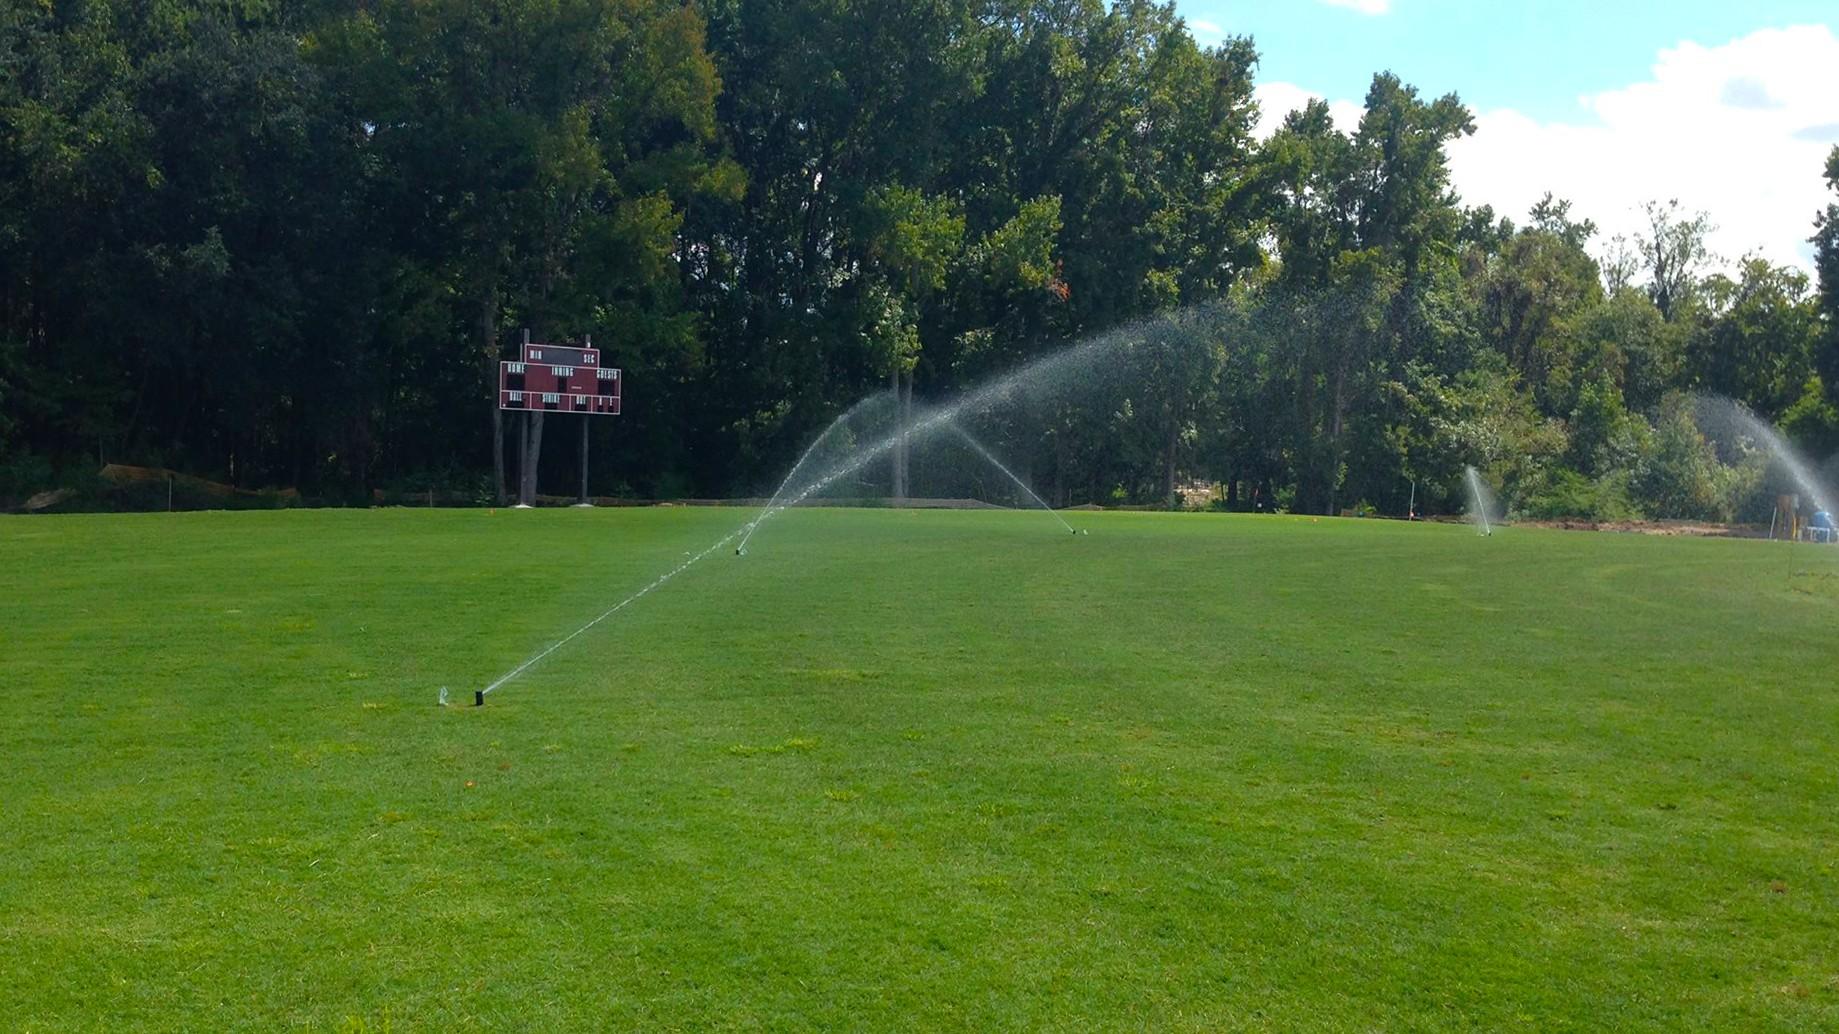 Sprinkler-Systems-For-Fields-South-Carolina